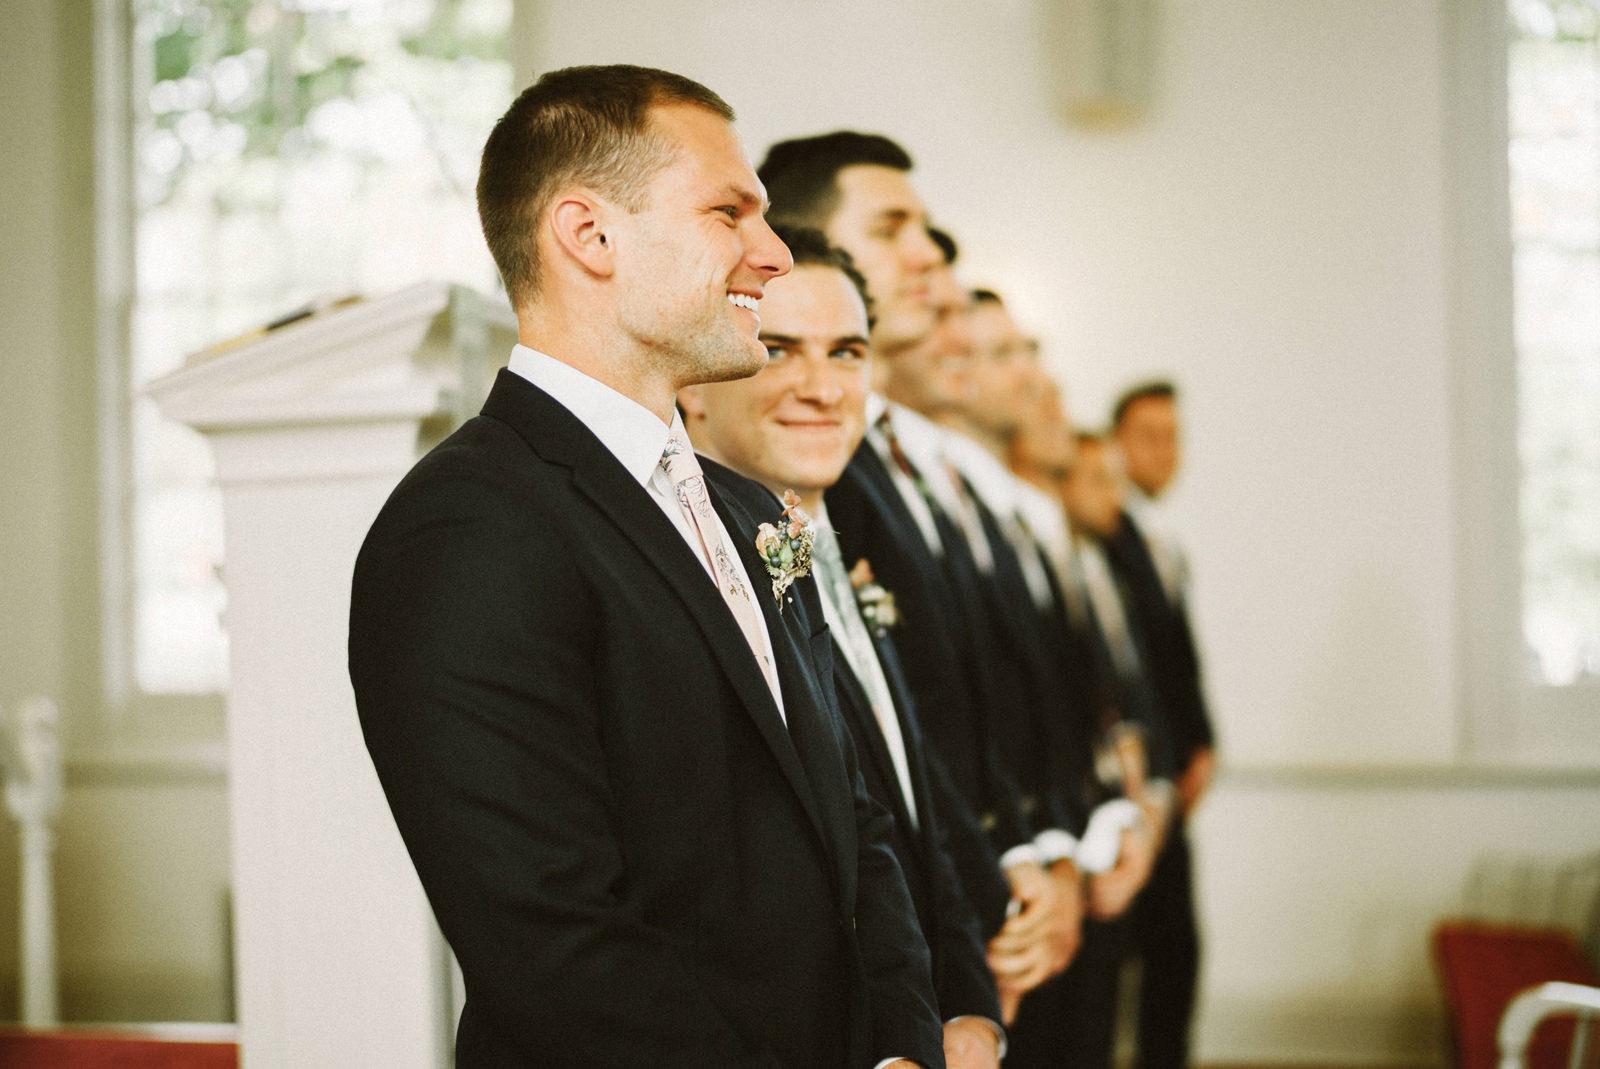 bridgeport-wedding-041 BRIDGEPORT, CONNECTICUT BACKYARD WEDDING